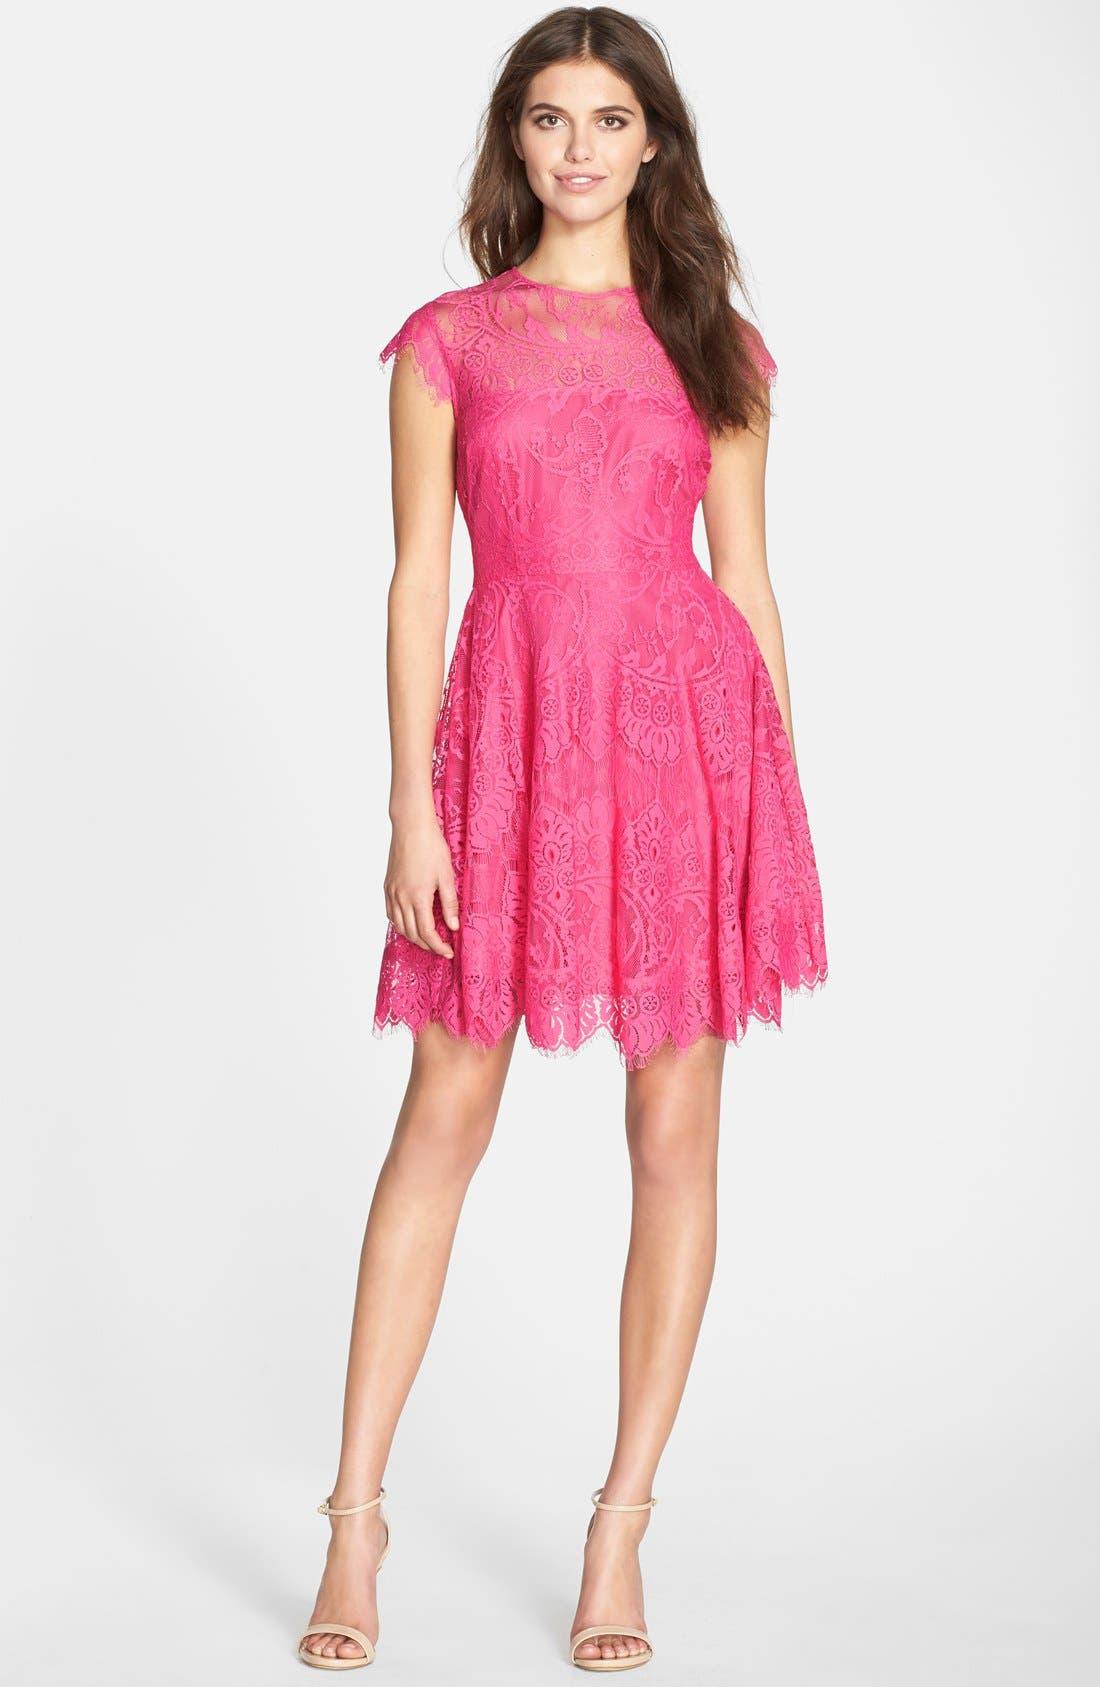 'Rhianna' Illusion Yoke Lace Fit & Flare Dress,                             Alternate thumbnail 3, color,                             Fuchsia/ Rose